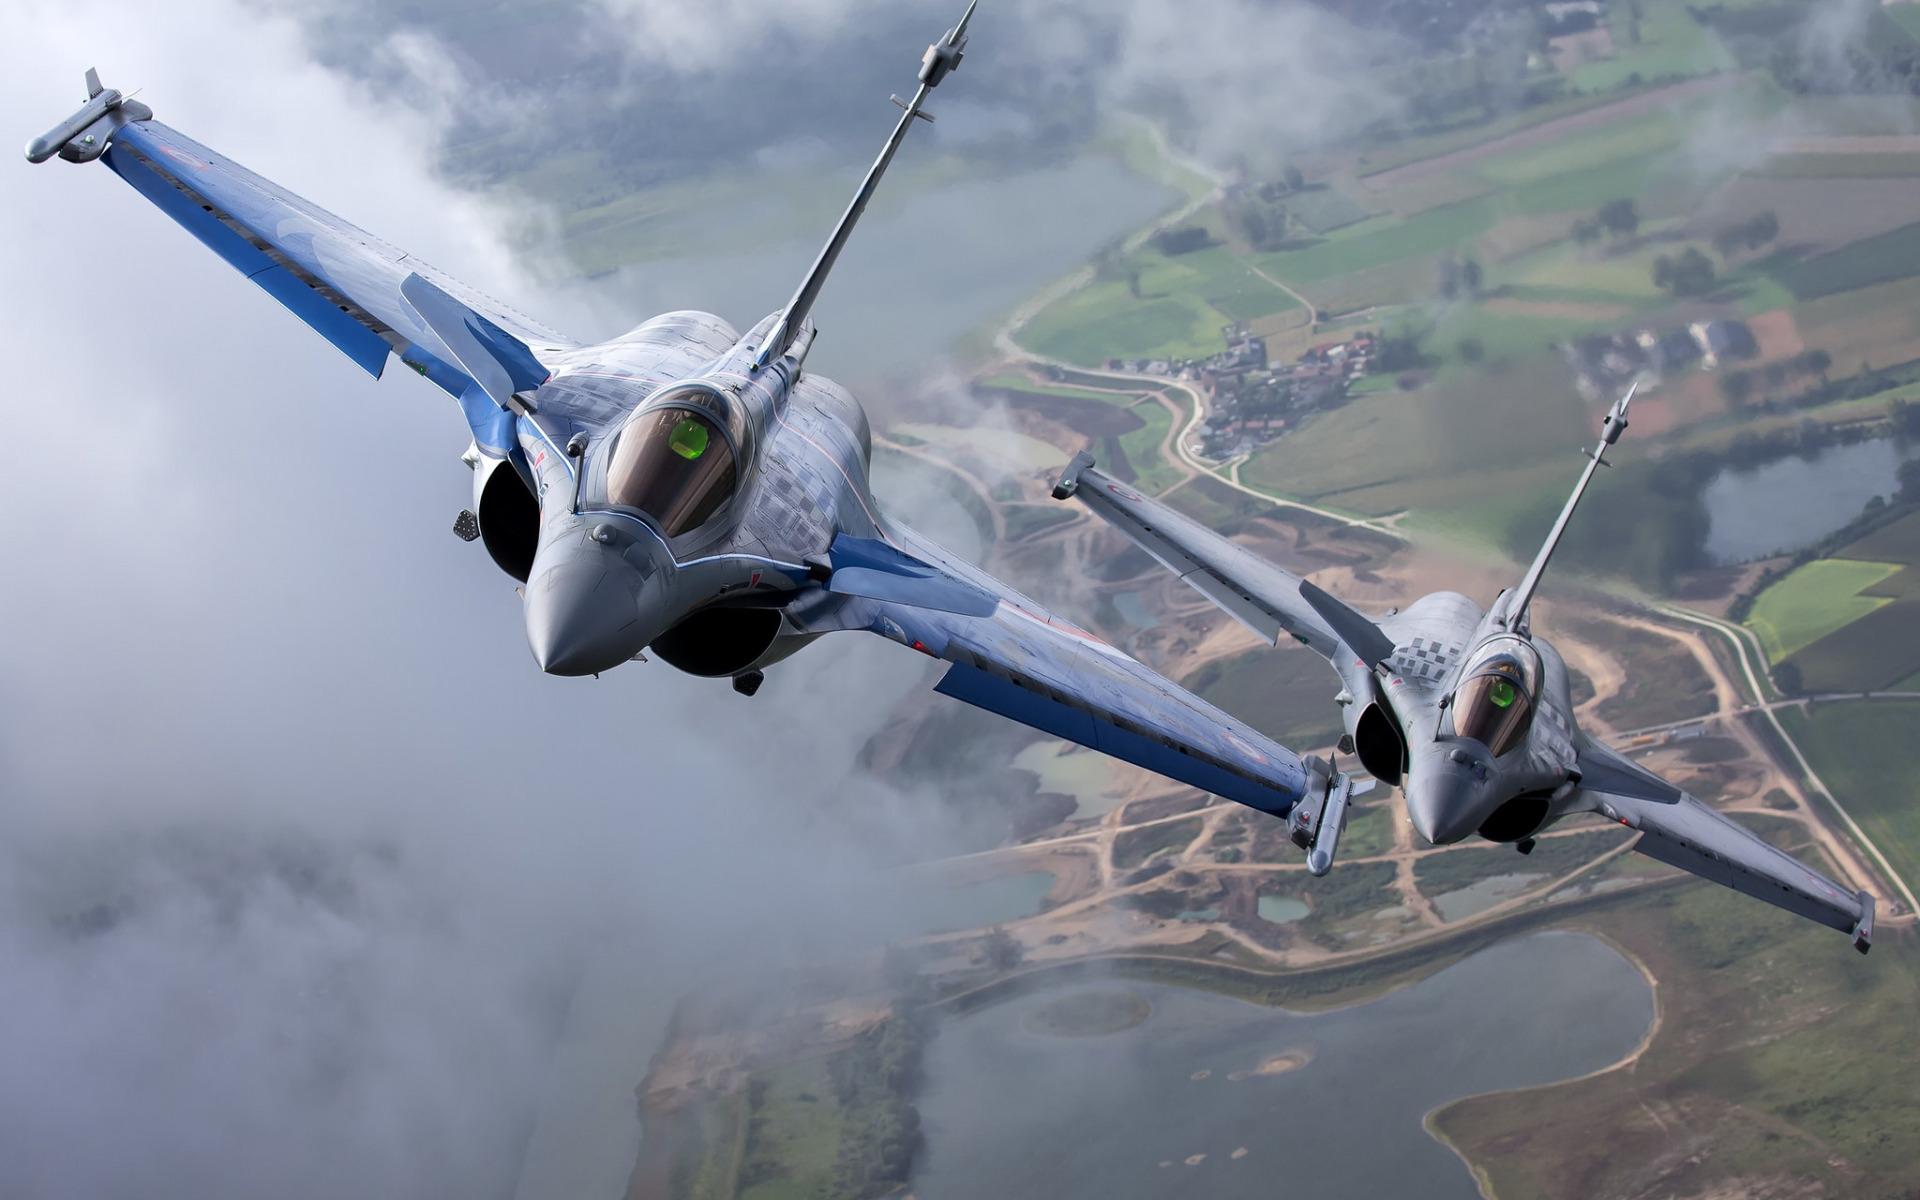 Dassault Rafale Fighter Fighter Two Combat Aircraft 1920x1200 Download Hd Wallpaper Wallpapertip